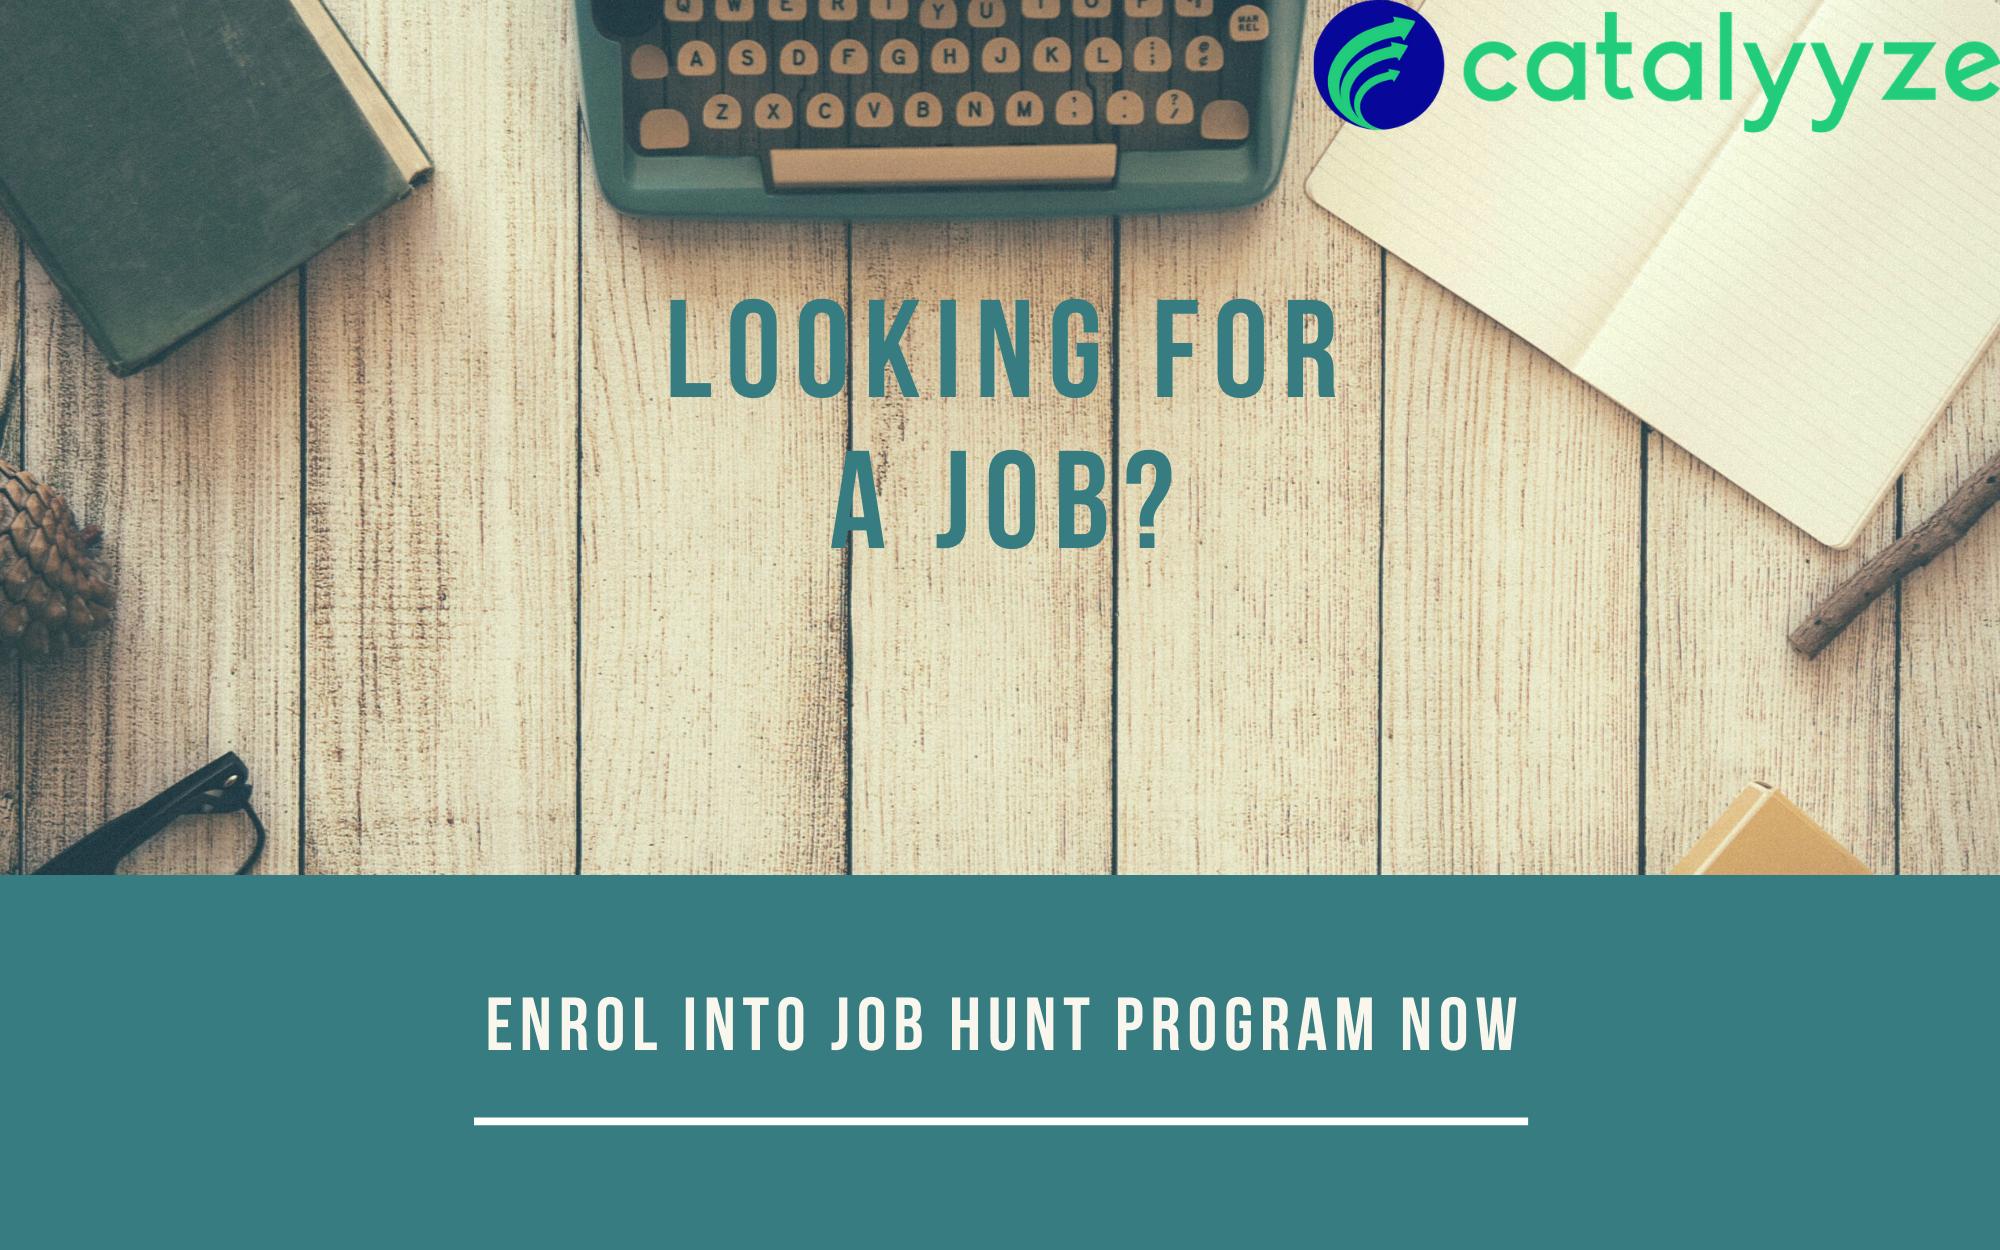 Job hunt program